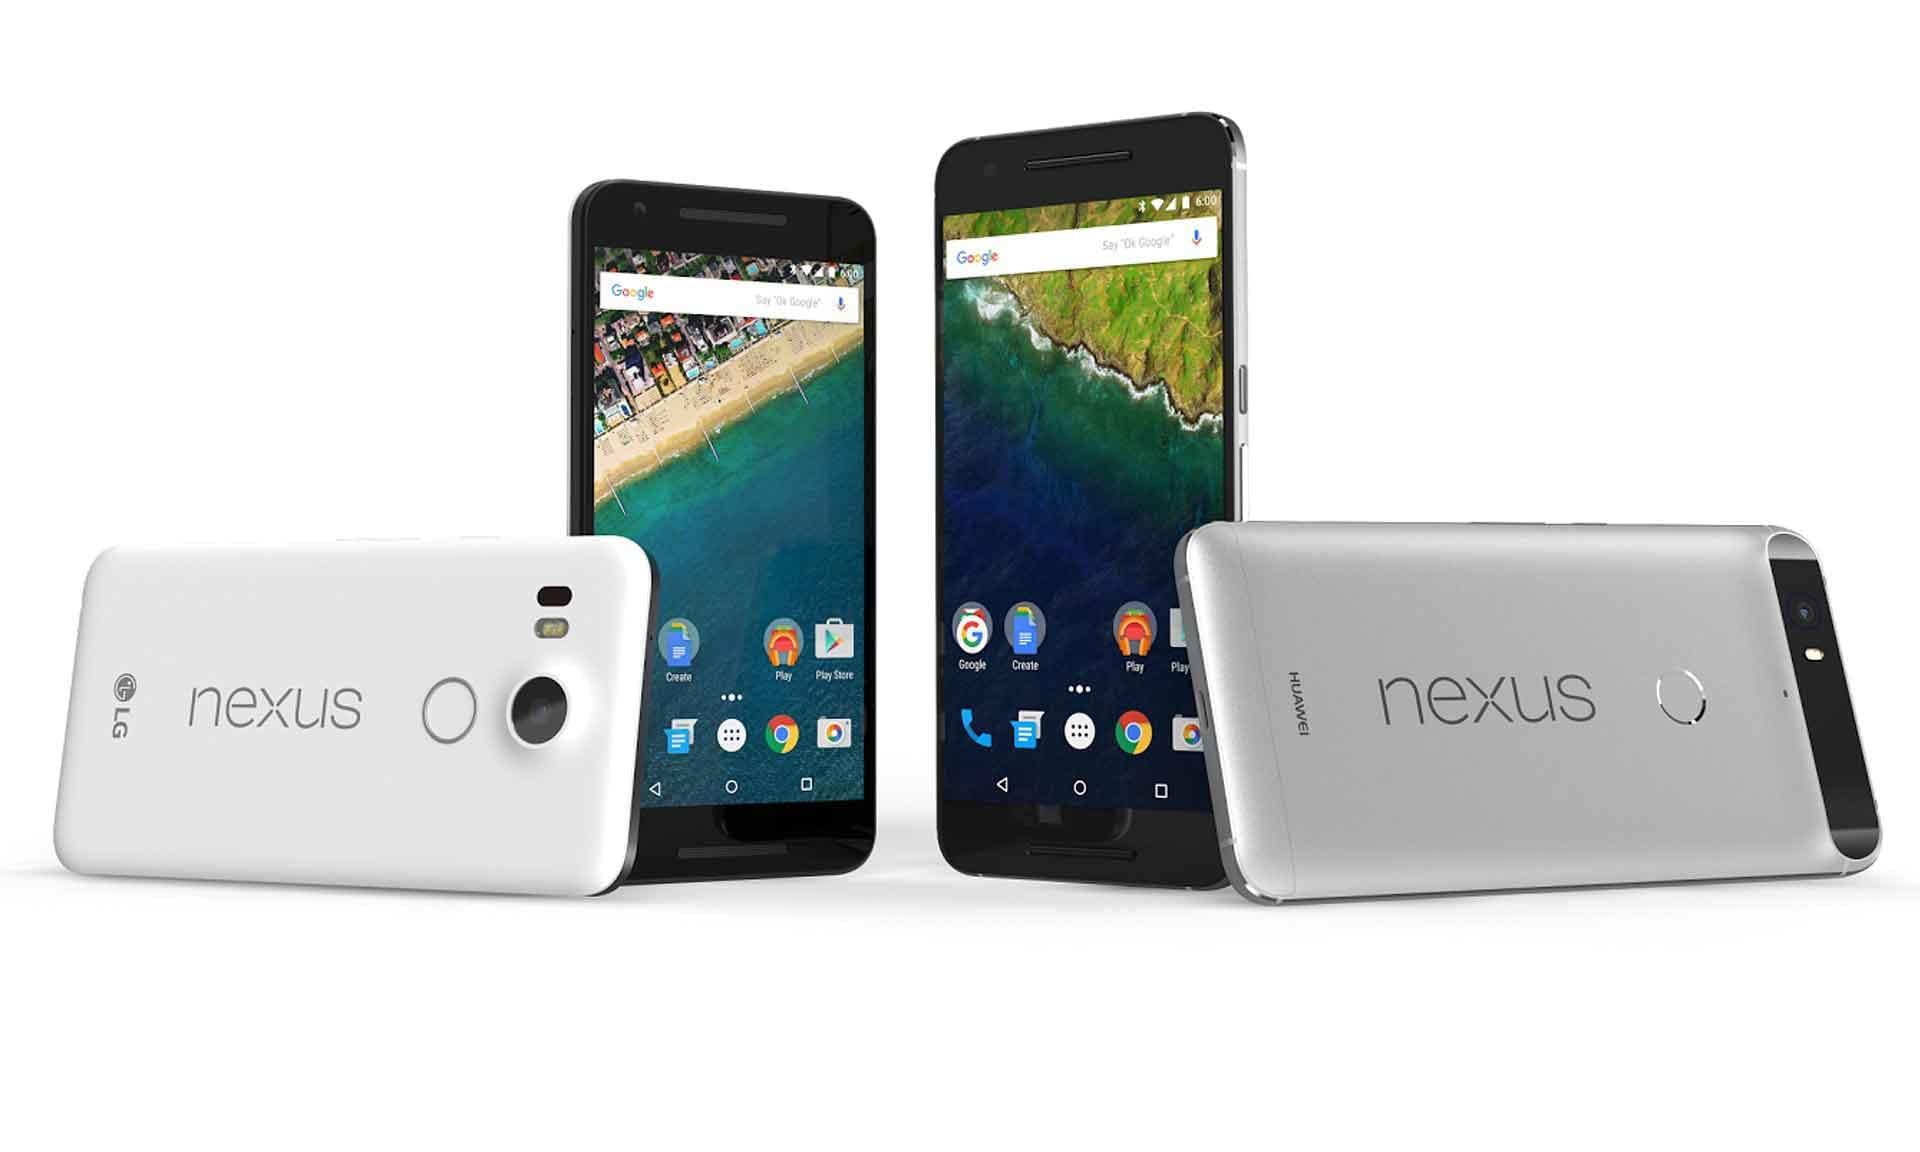 Google to Take Full Control Over Nexus Design